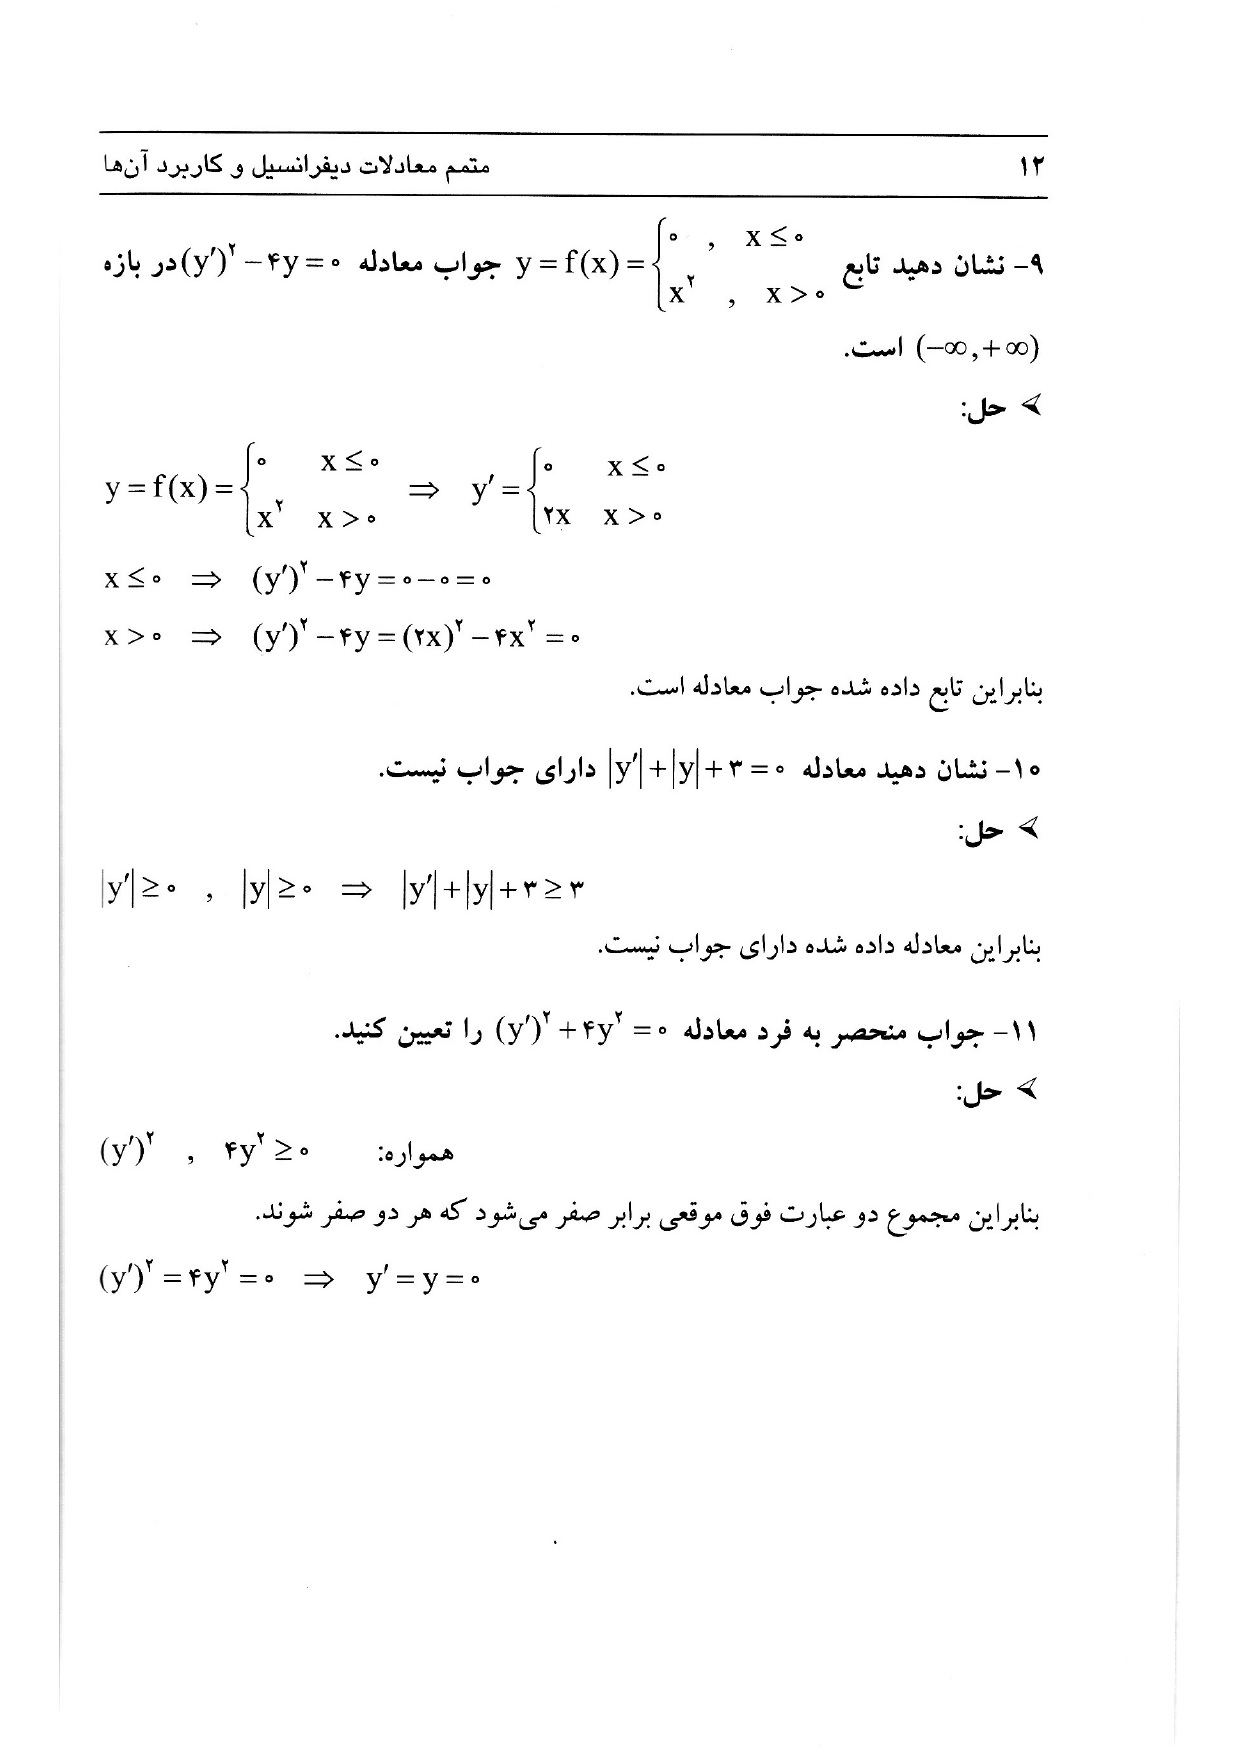 حل المسائل معادلات دیفرانسیل کرایه چیان